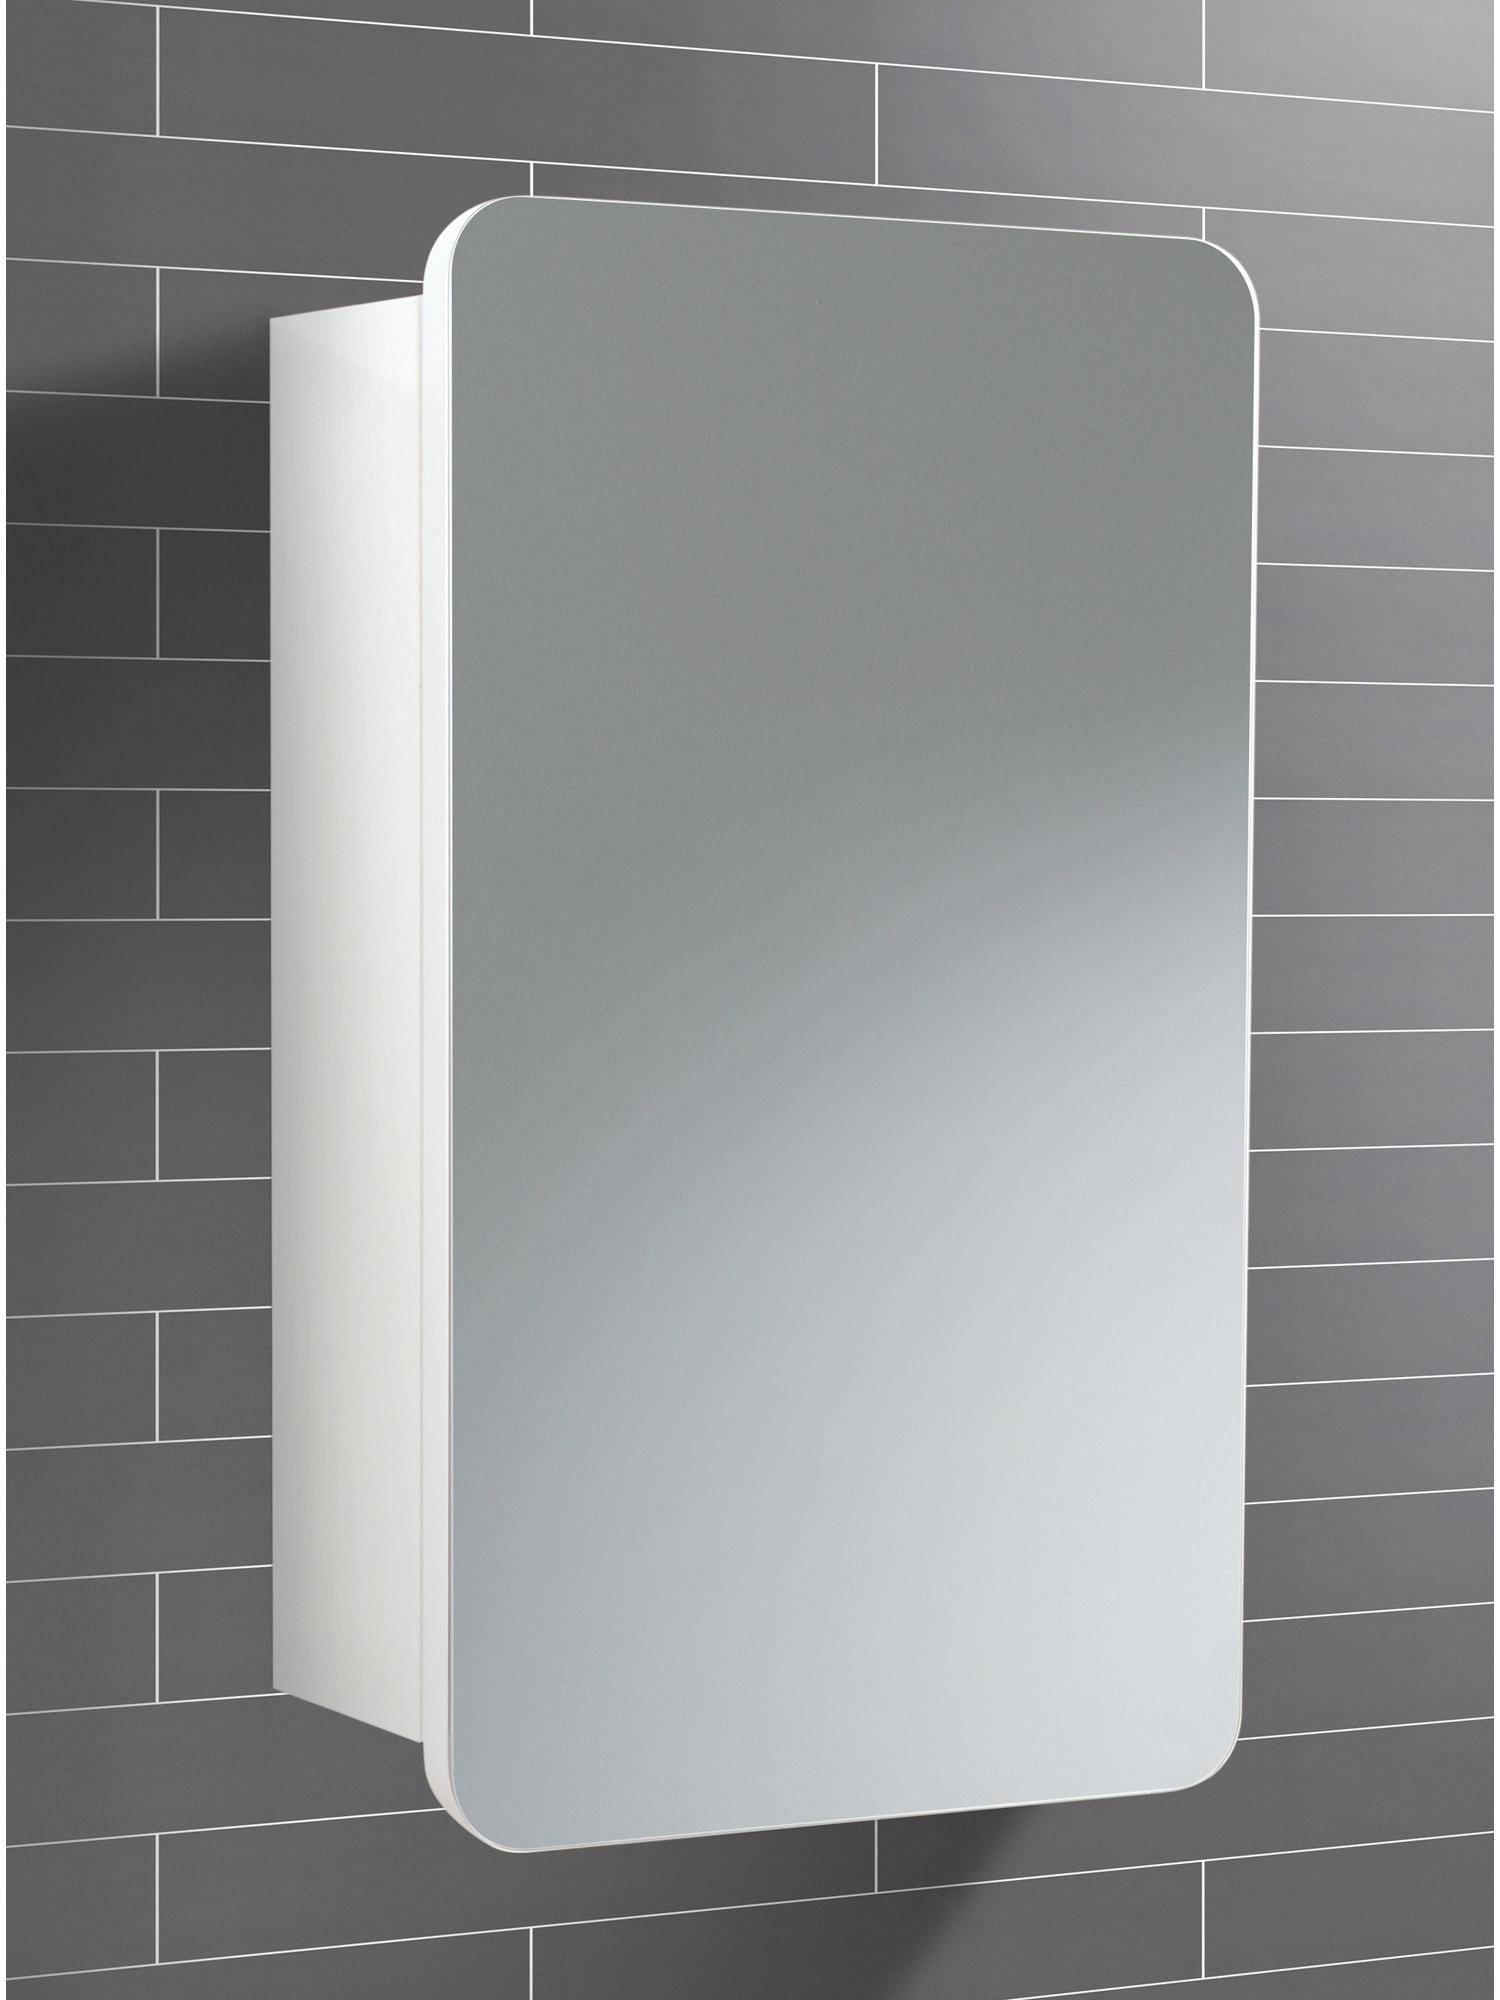 HIB Montana Single Door Bathroom Mirrored Cabinet 350 x